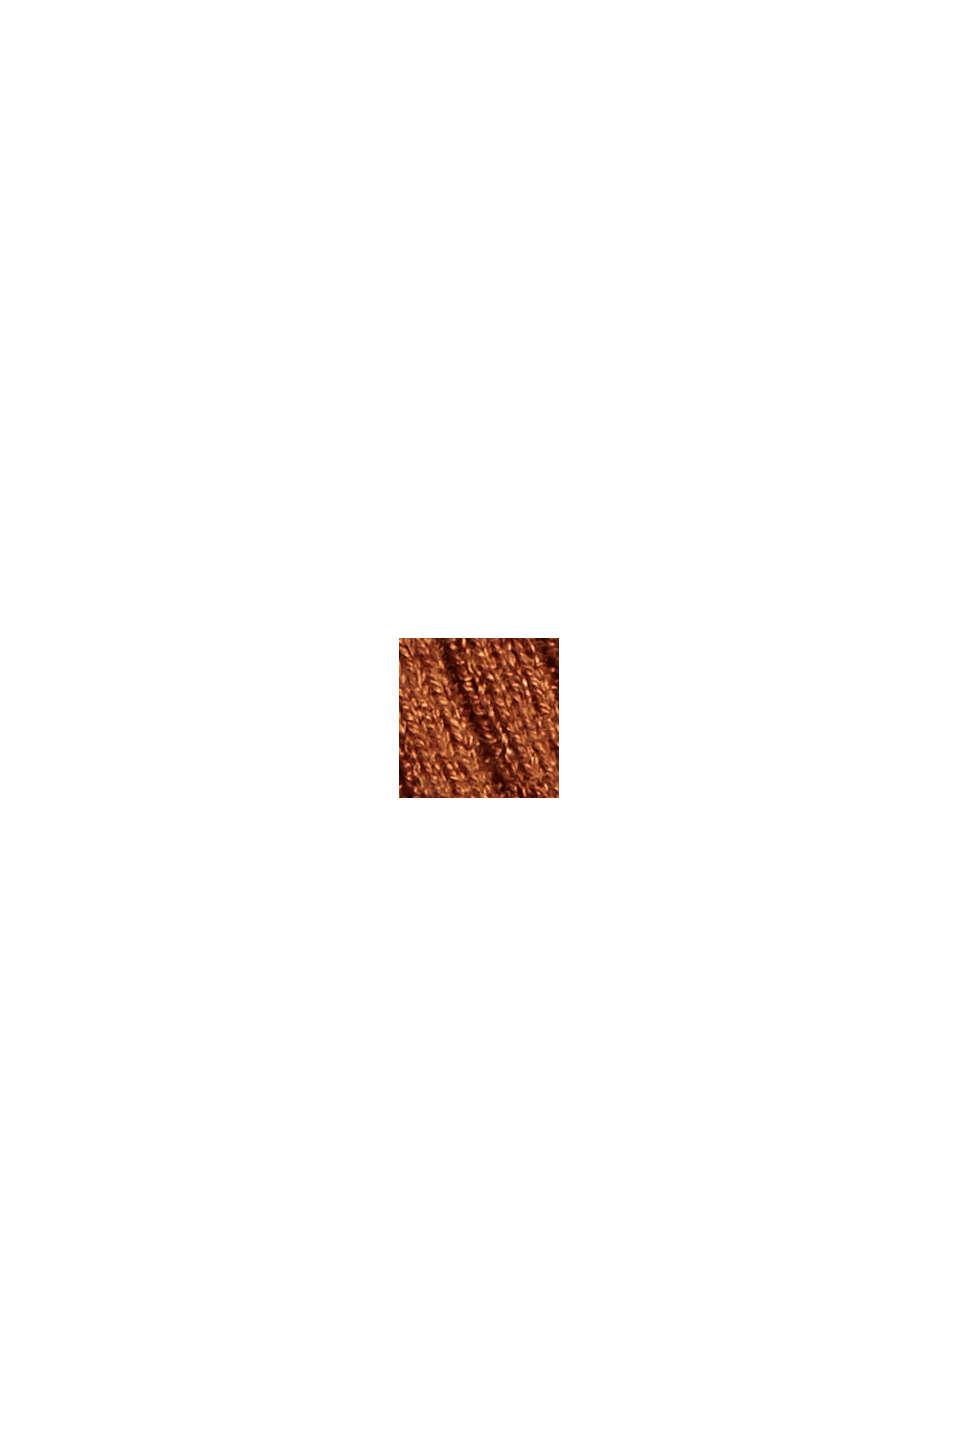 Wool blend: Textured, short-sleeved jumper, TOFFEE, swatch